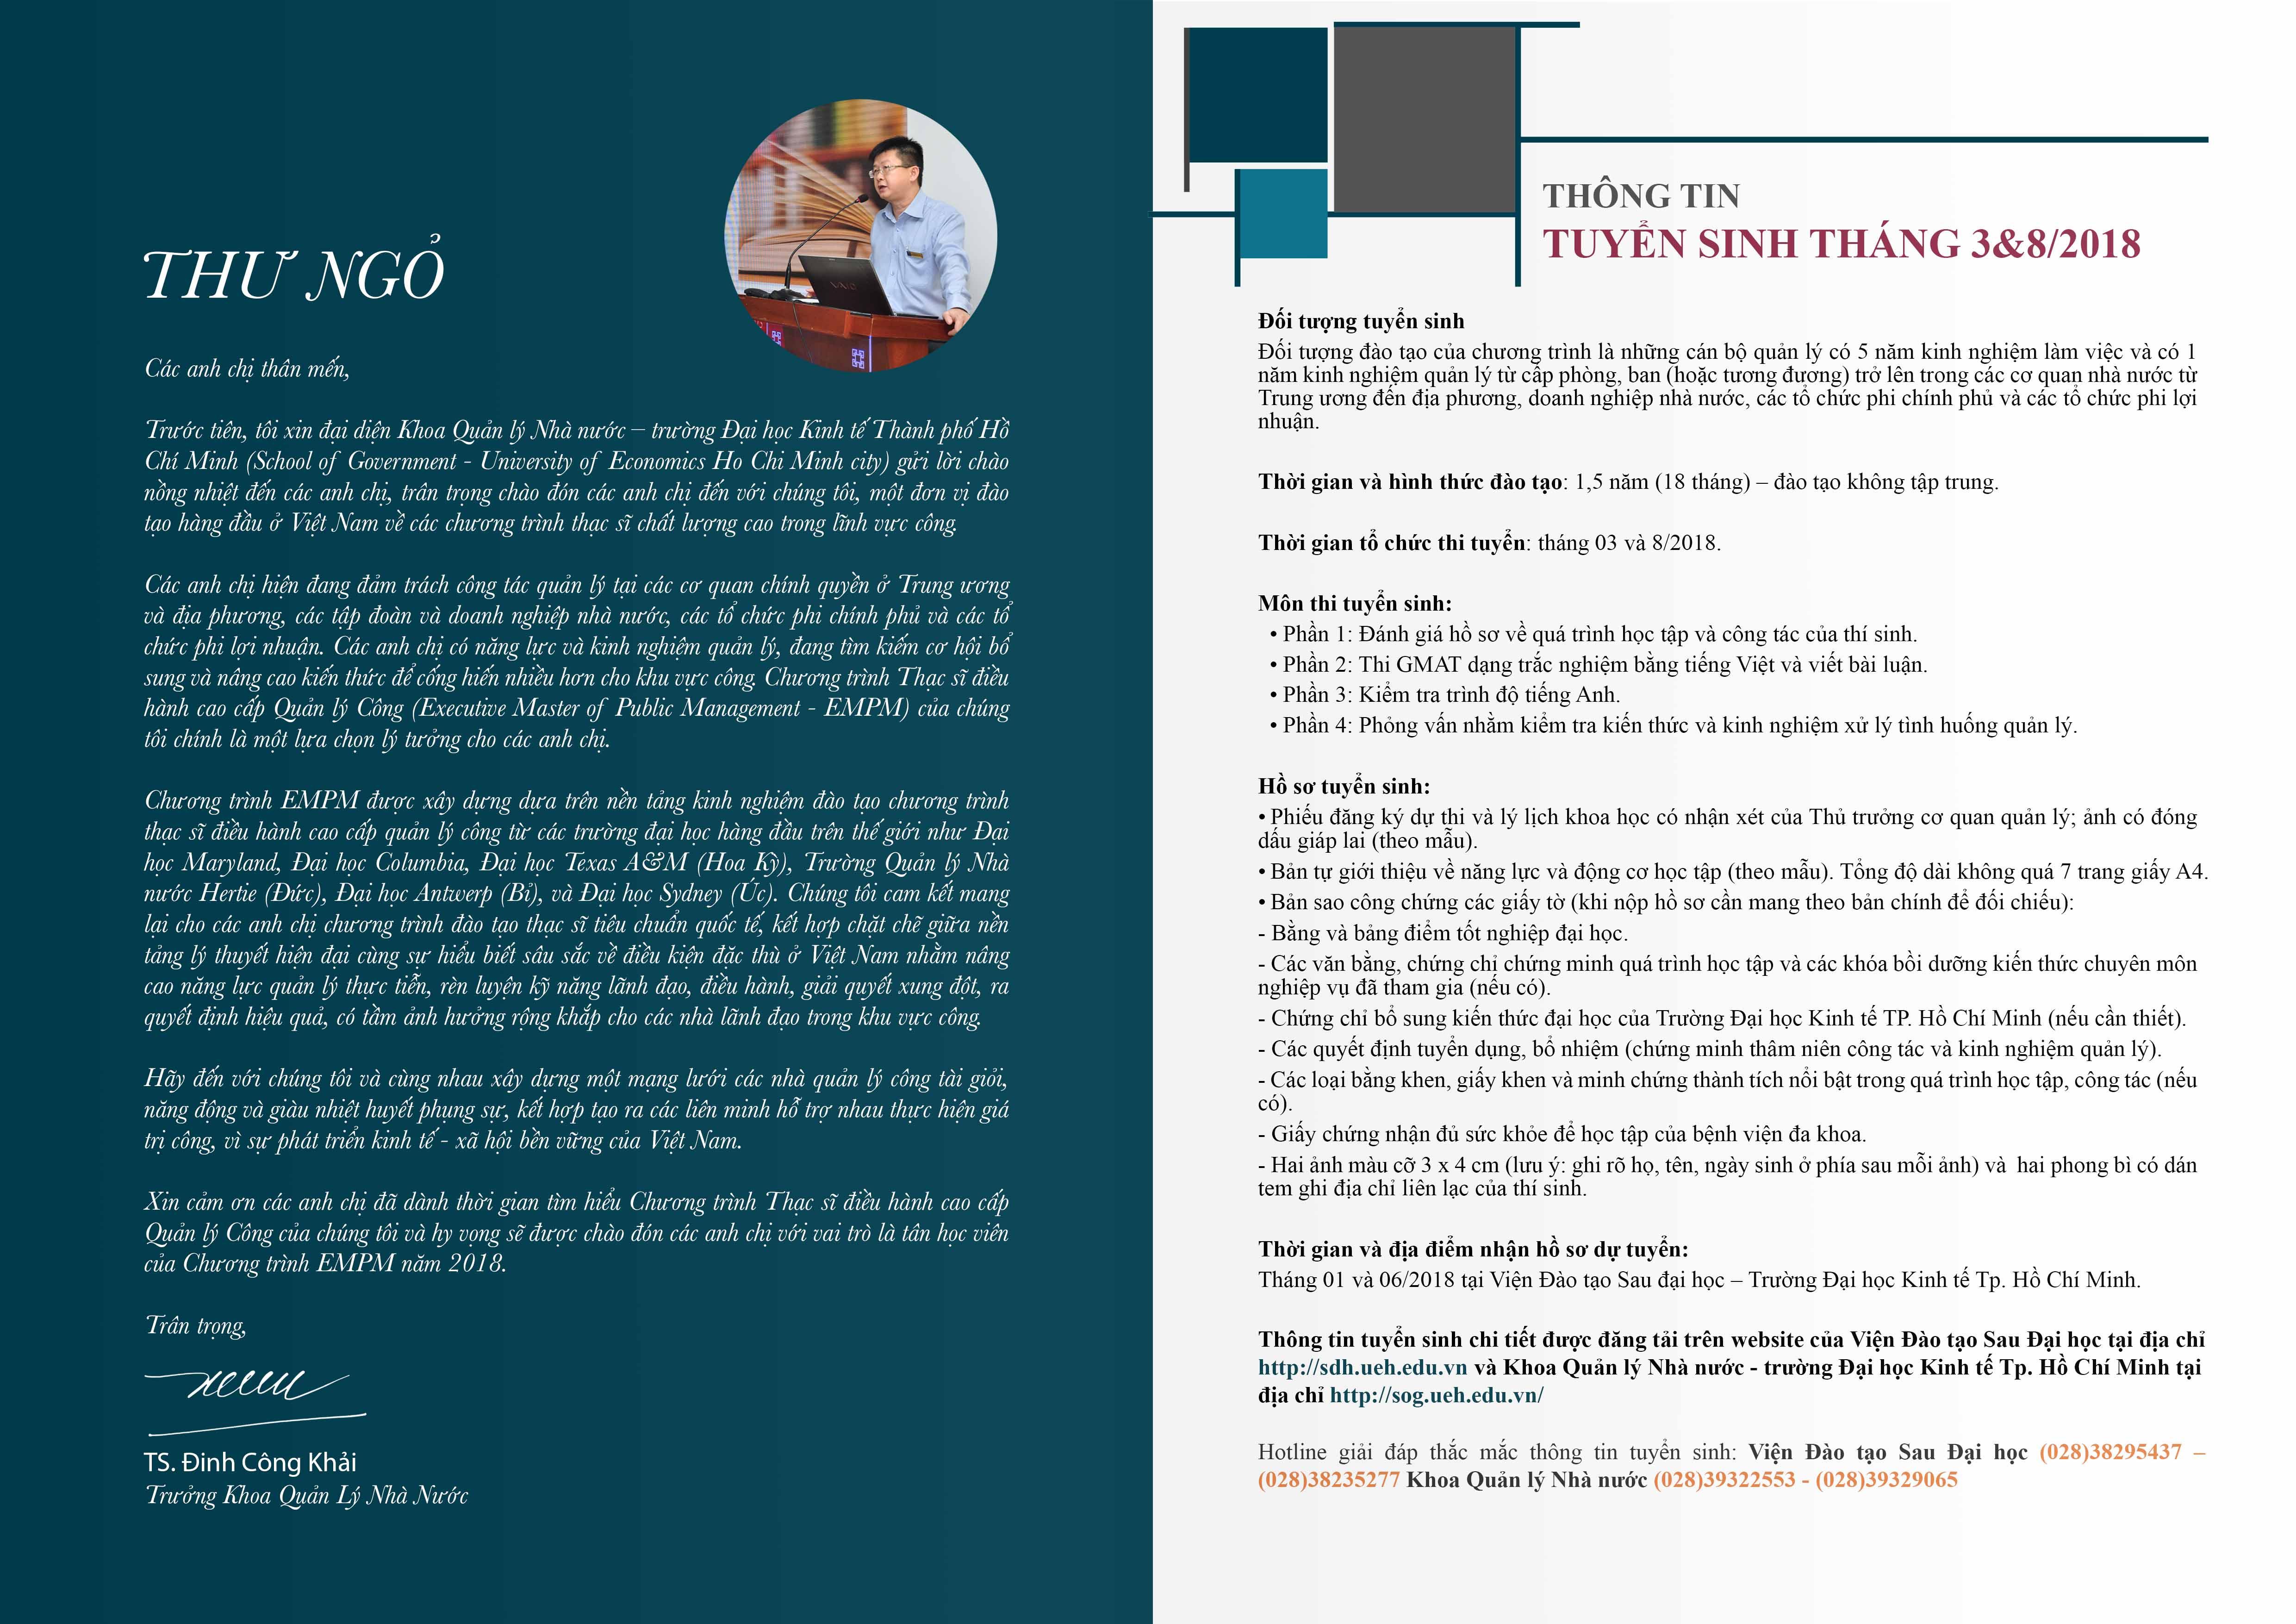 EMPM - Page 1_2